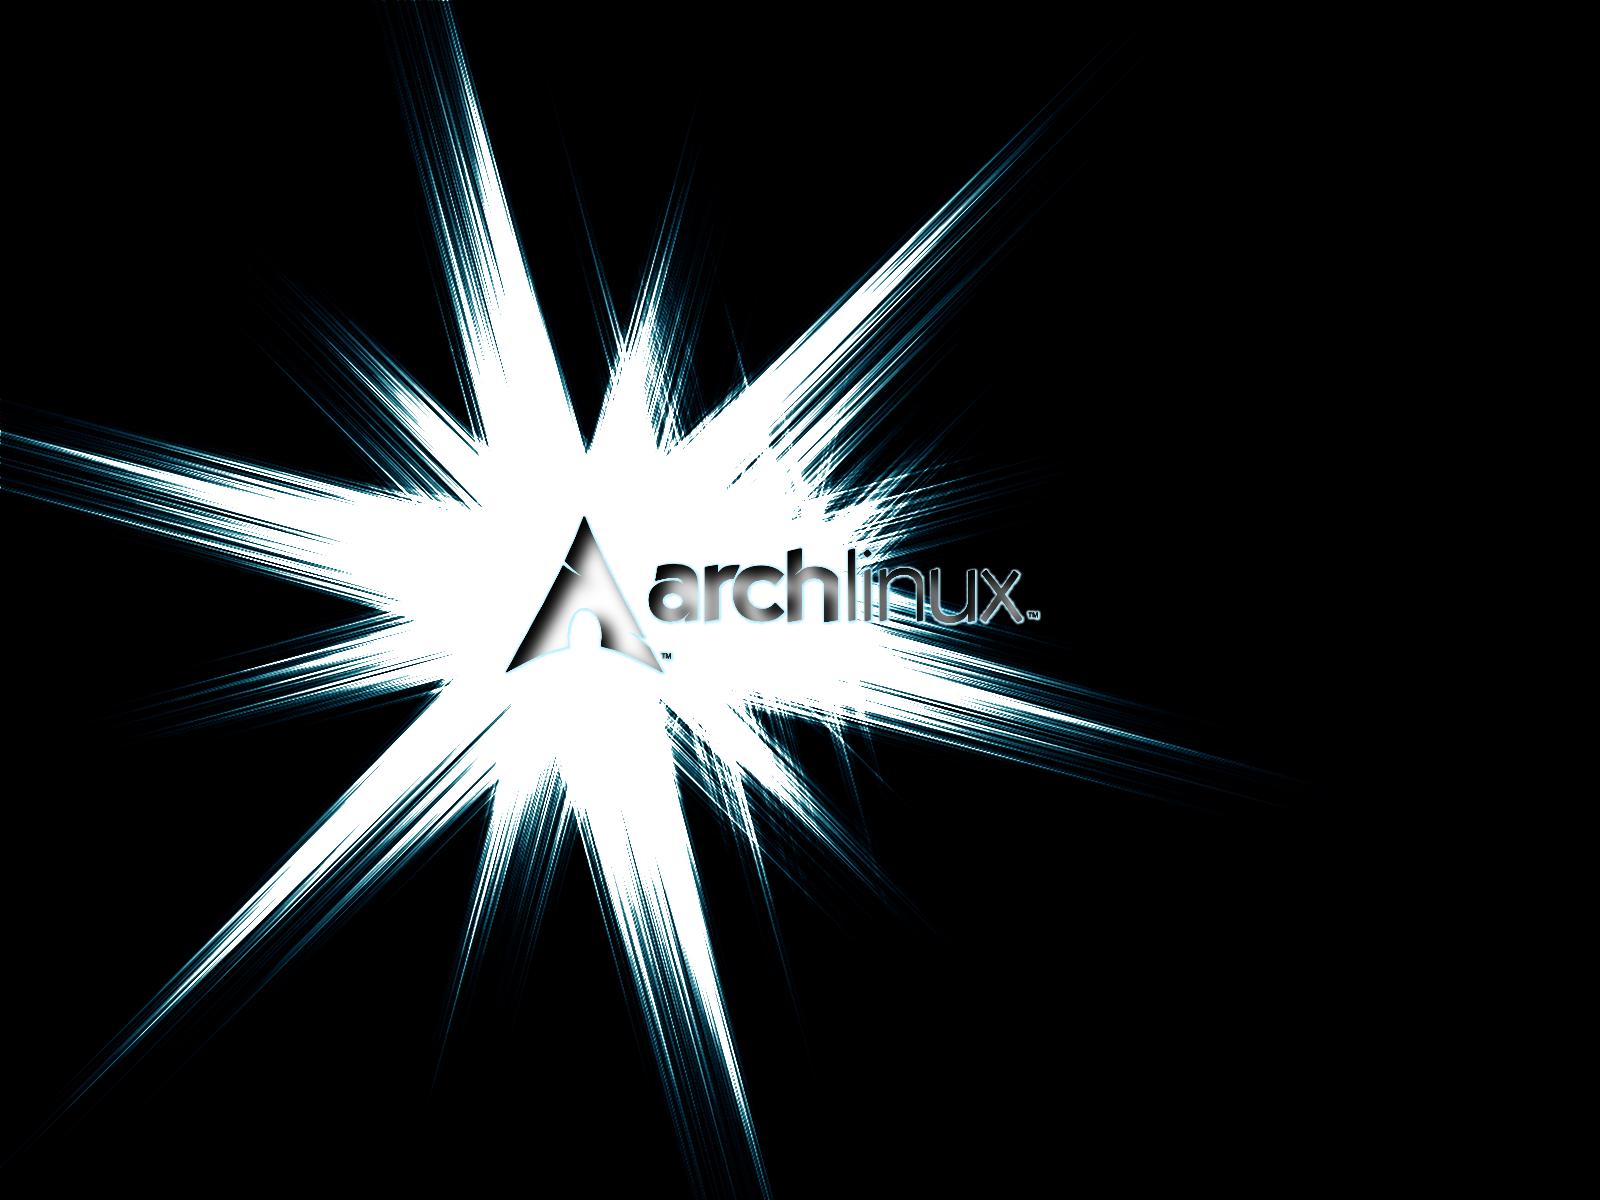 arch linux blackice background by tycon712 customization wallpaper mac 1600x1200